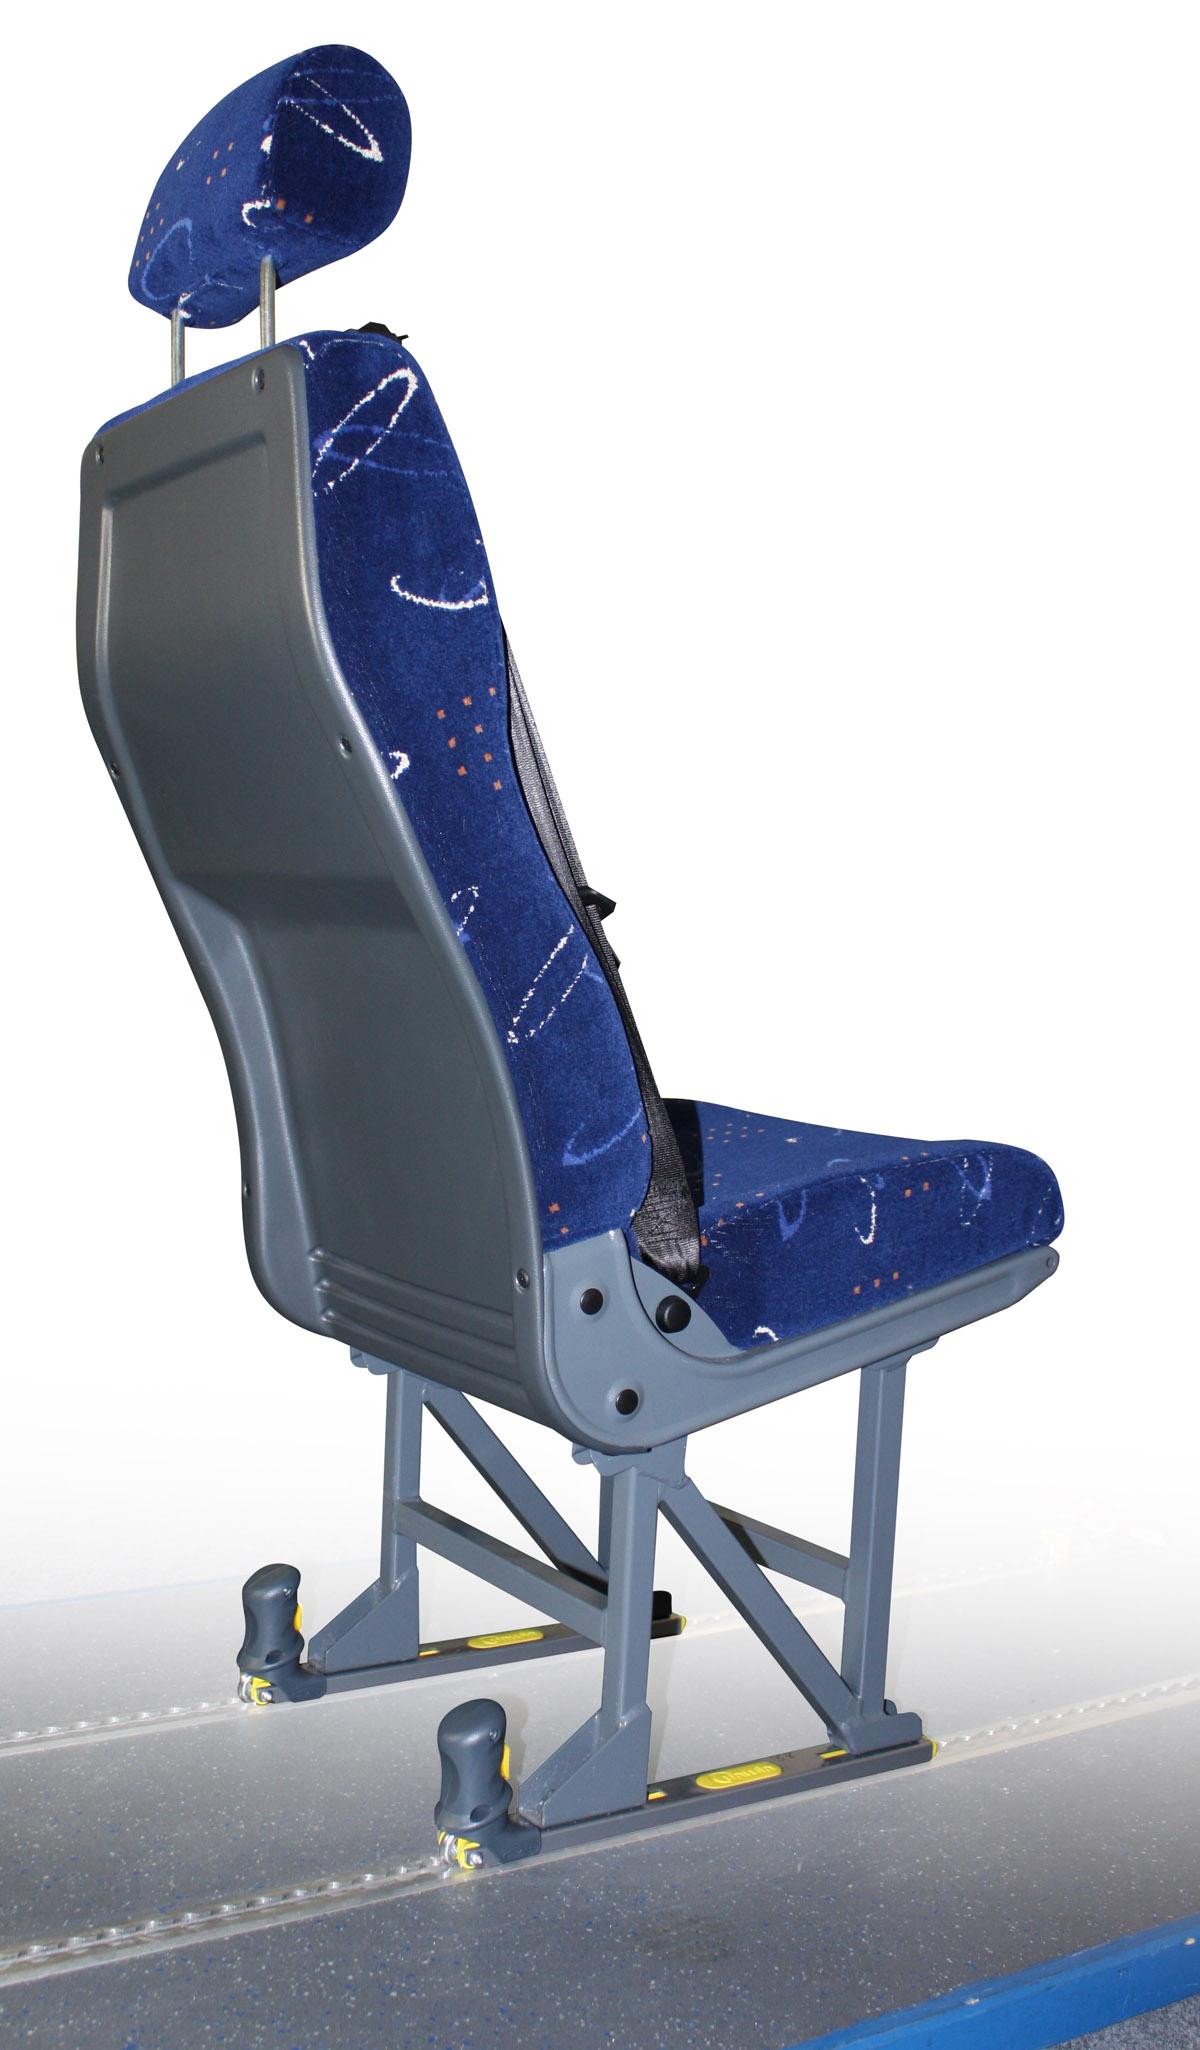 Fixation siège fauteuil roulant HAL